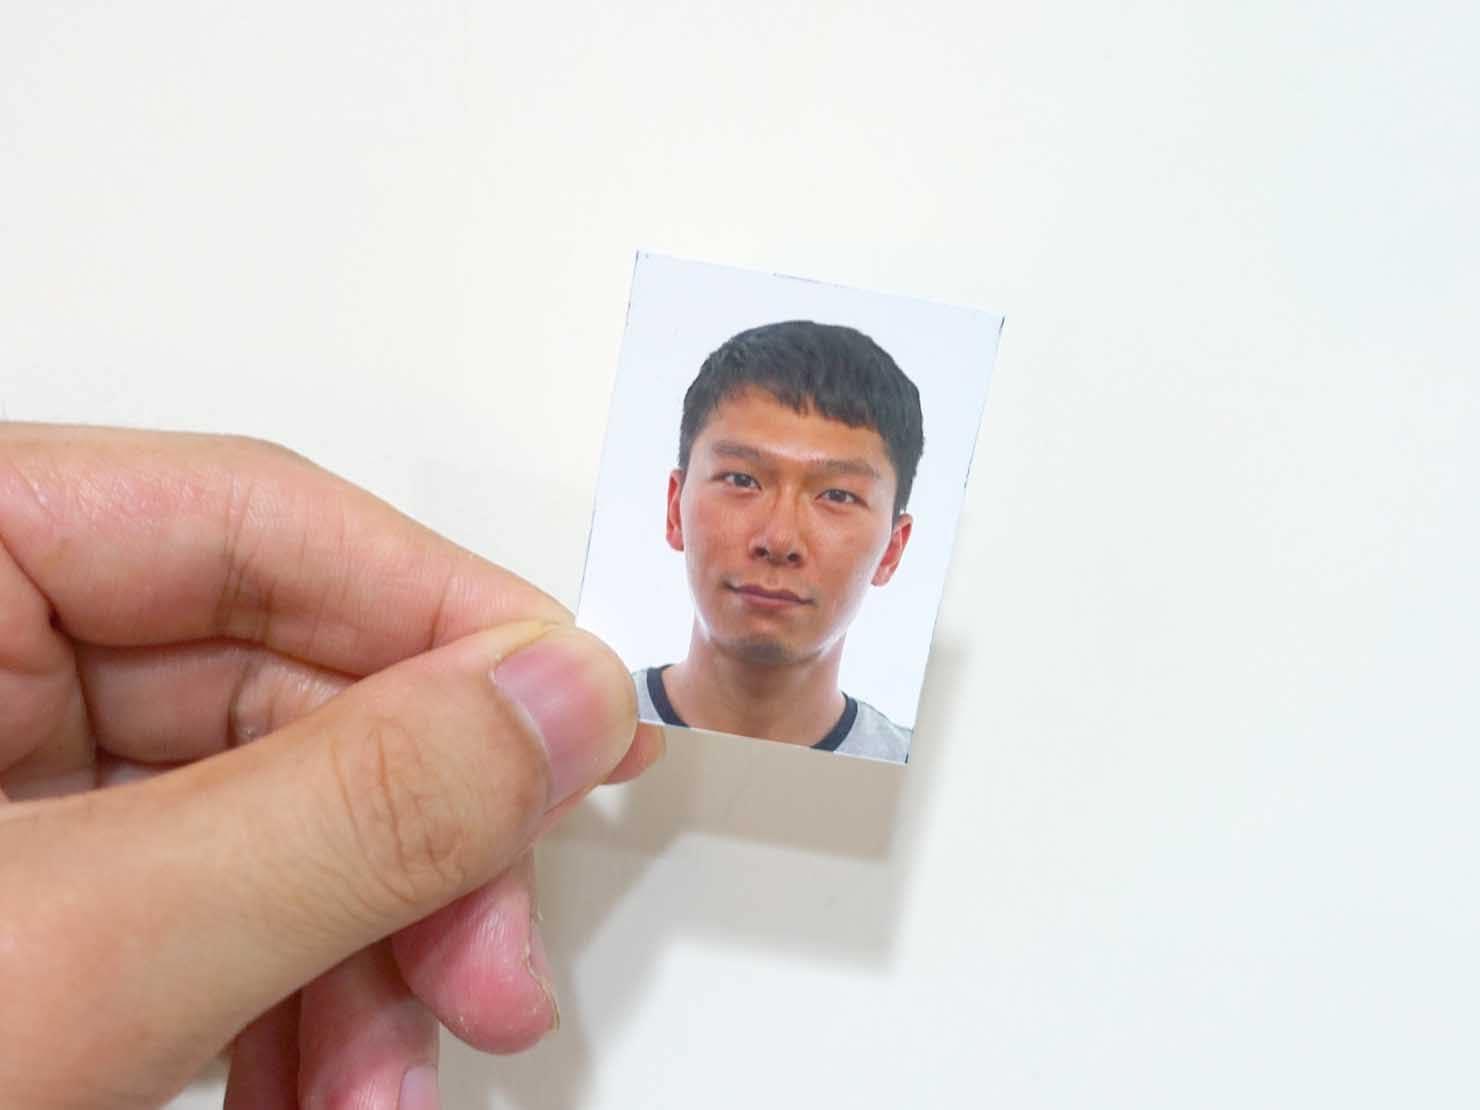 台湾の永住権(永久居留證)申請に必要な書類:顔写真